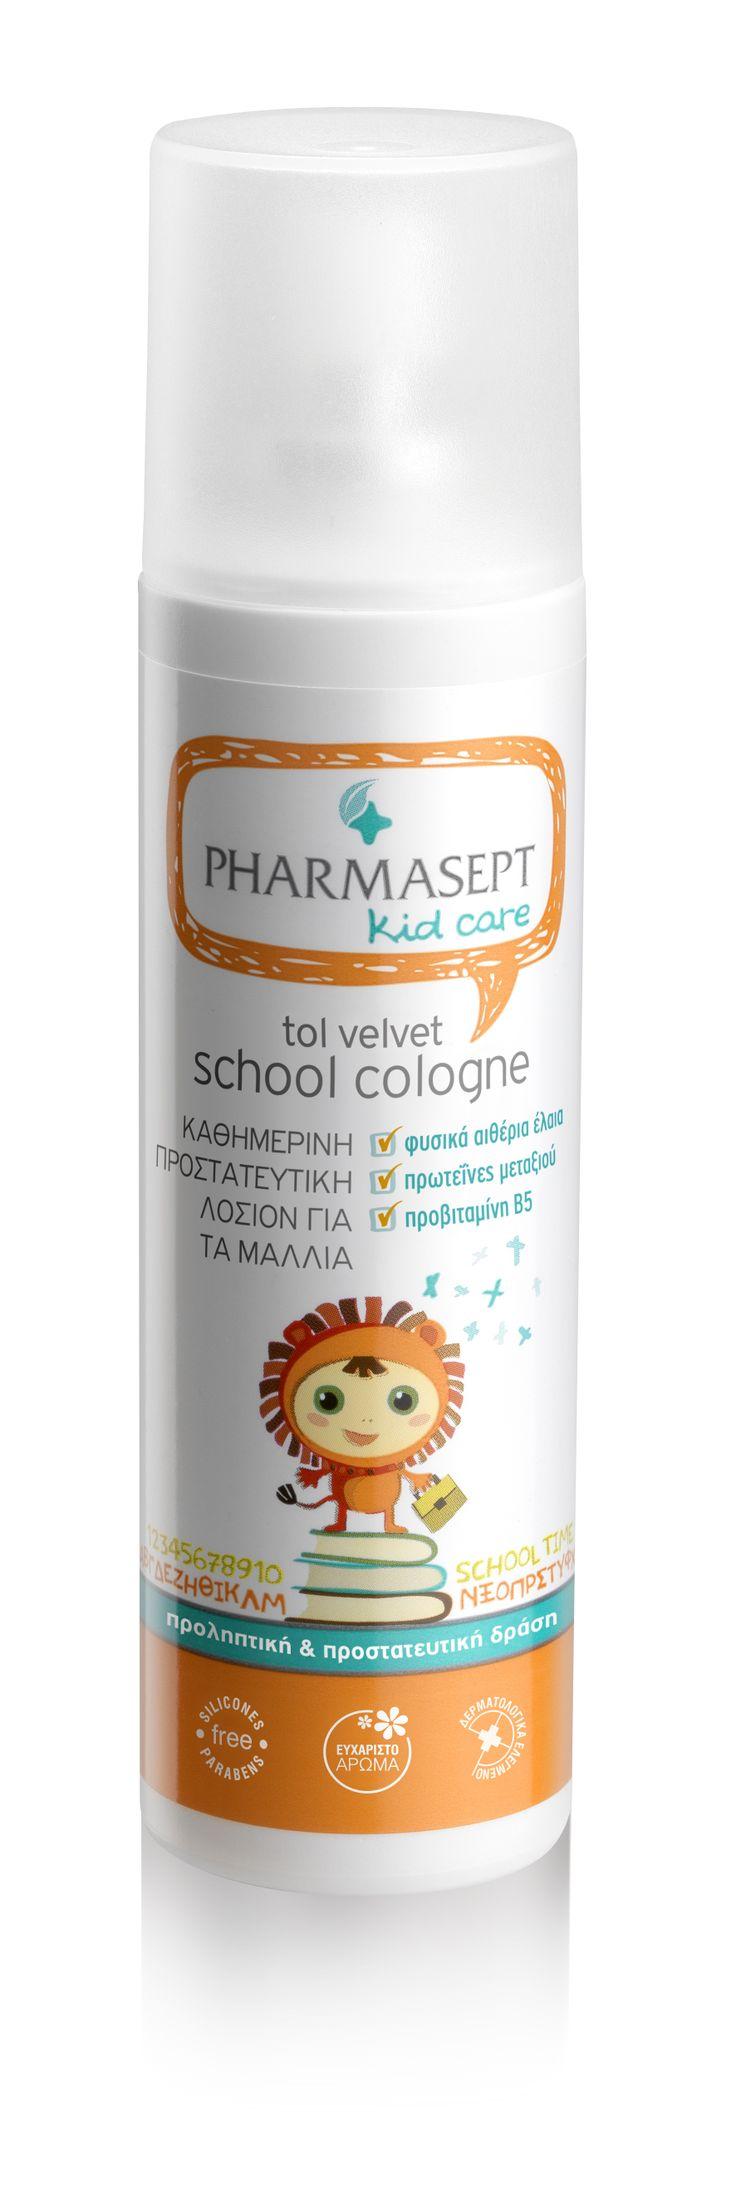 TOL VELVET SCHOOL COLOGNE 100ml Κλινικά μελετημένο στο Νοσοκομείο Αττικόν Κρατήστε τις ψείρες σε απόσταση! To Tol Velvet School Cologne είναι μία αρωματική λοσιόν με φυτικά αιθέρια έλαια που απομακρύνουν τις ψείρες, ευχάριστό άρωμα και πρωτεΐνες μεταξιού που περιποιούνται τα μαλλιά χωρίς να τα λαδώνουν. Για καθημερινή προληπτική χρήση